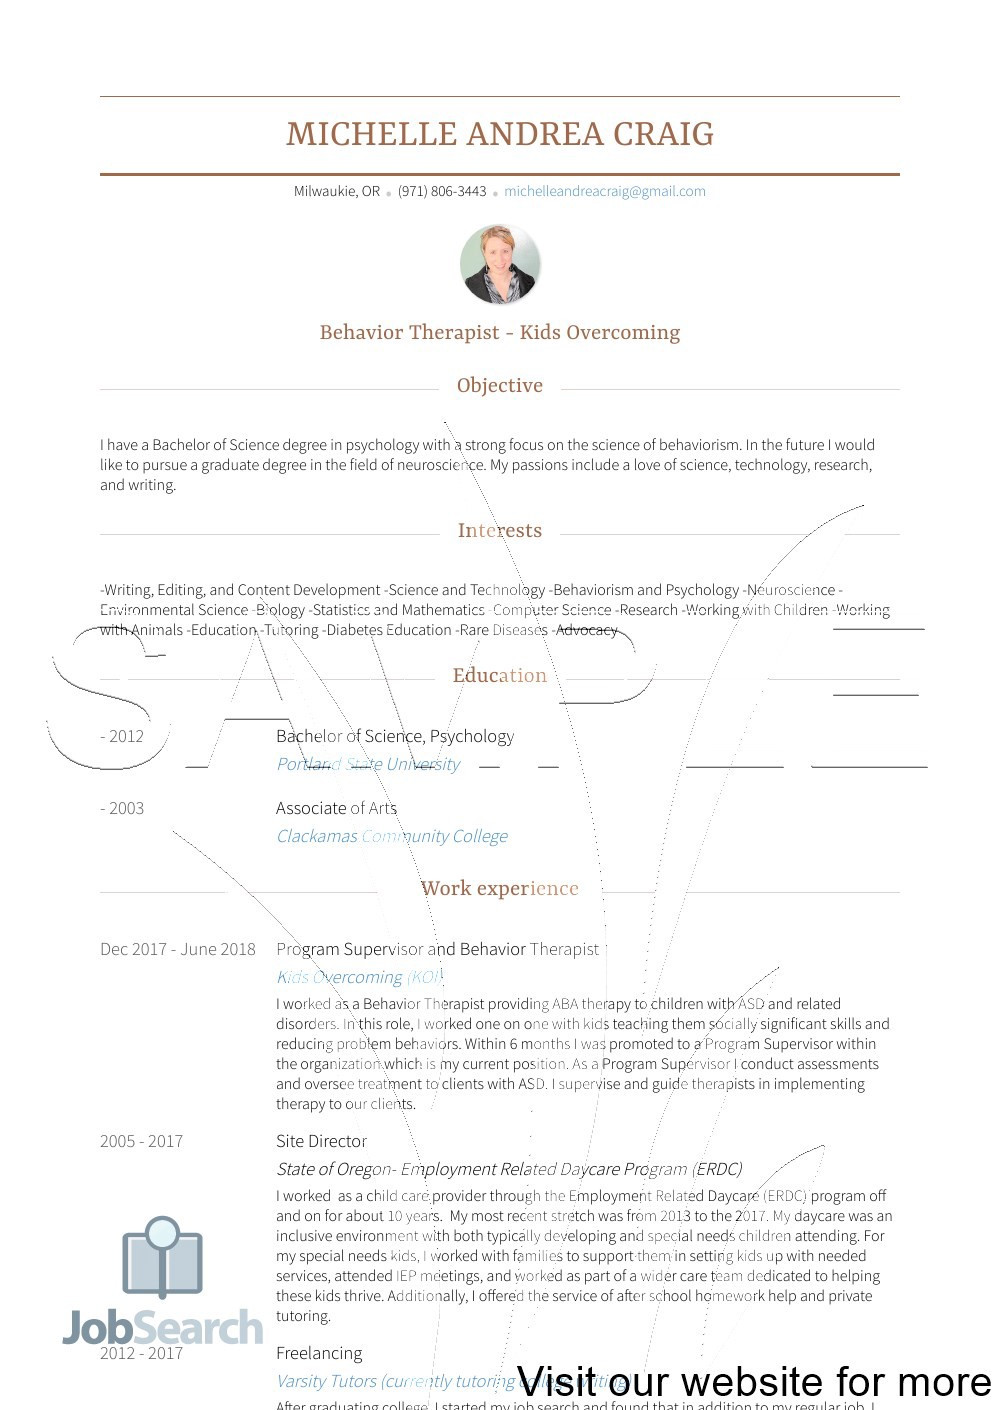 sample child care resume objectives australia 2020 92be0b461f82